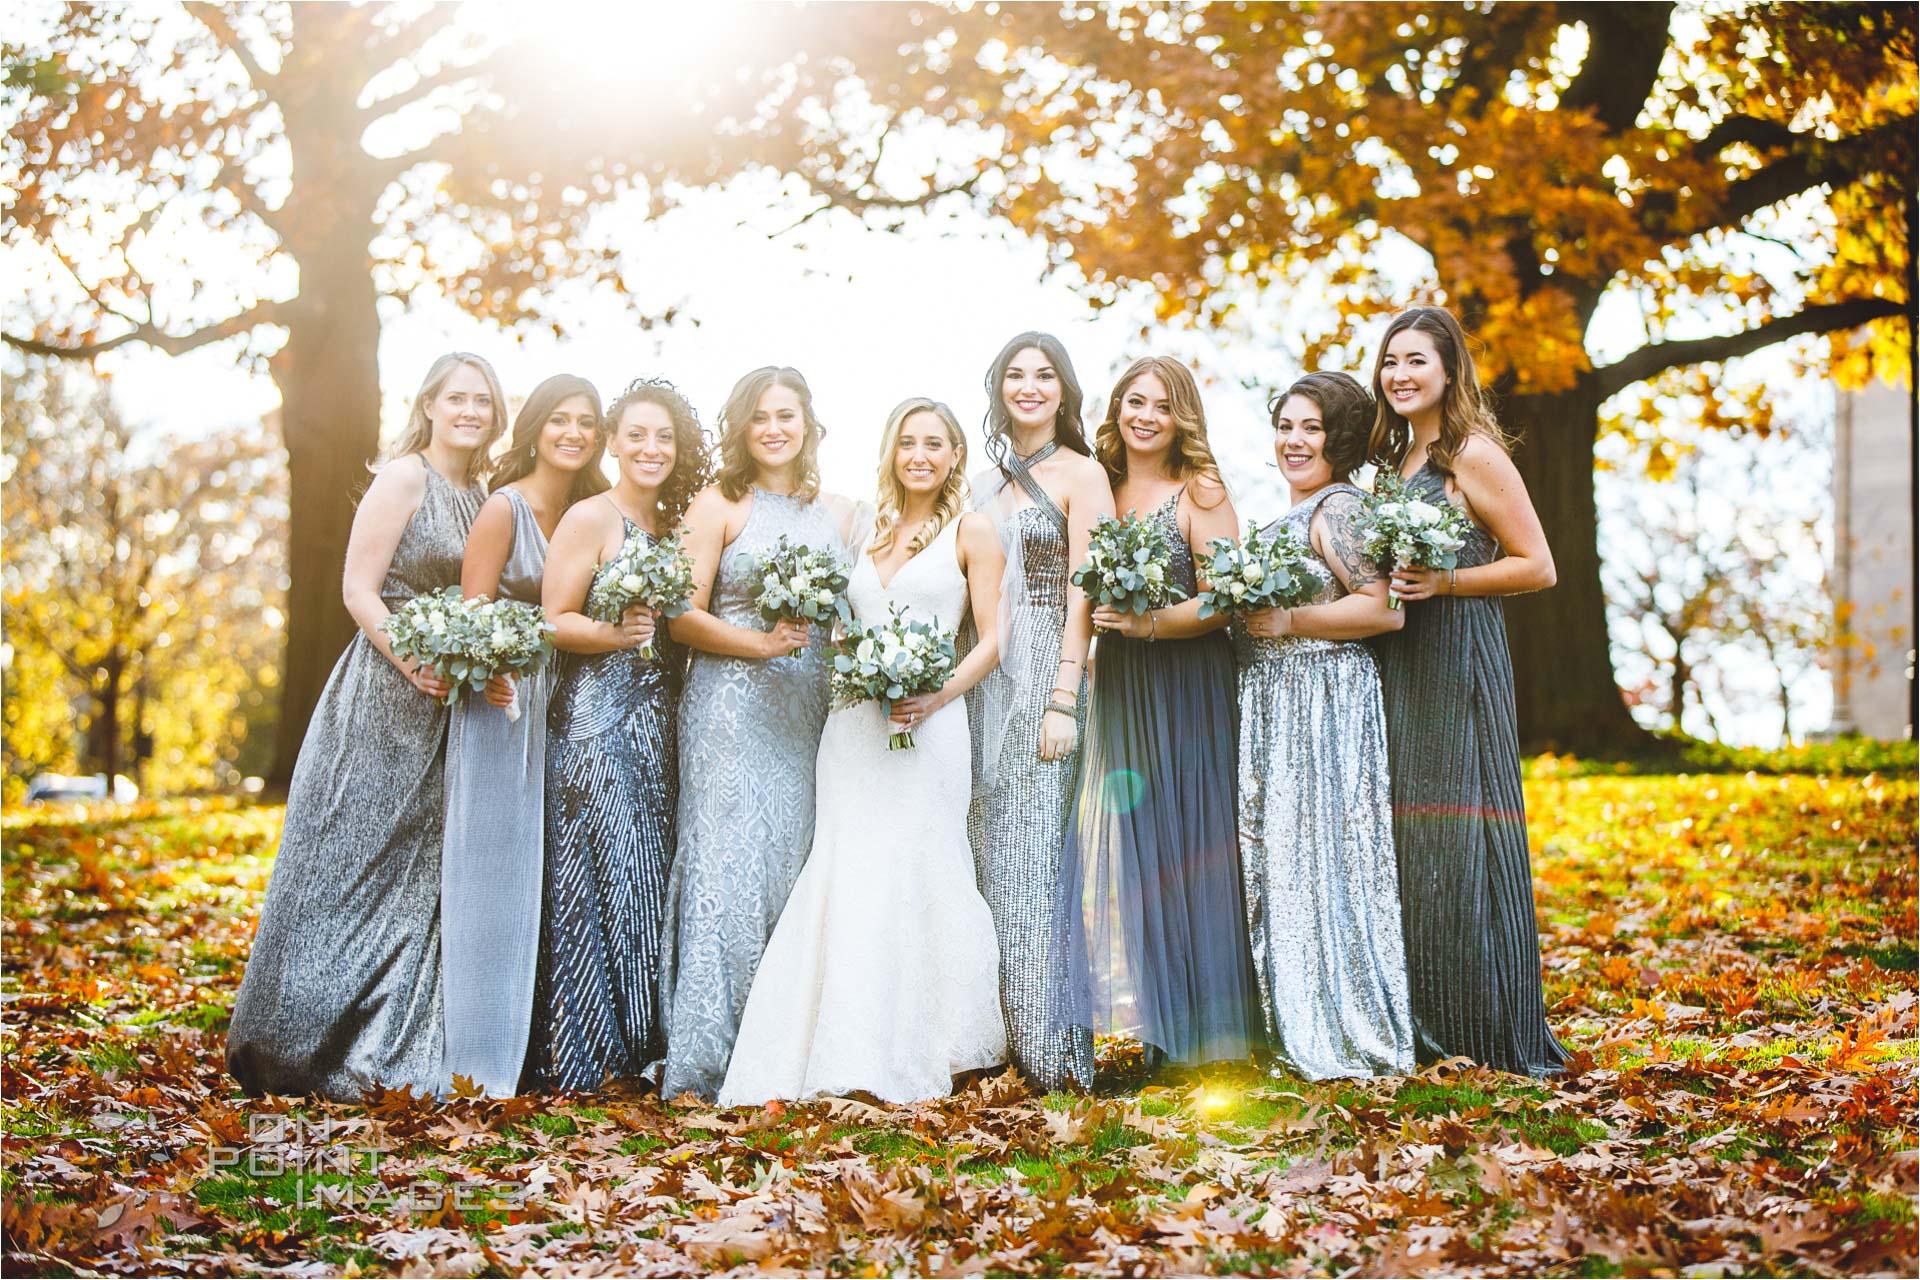 marquee-events-wedding-hartford-ct-17.jpg